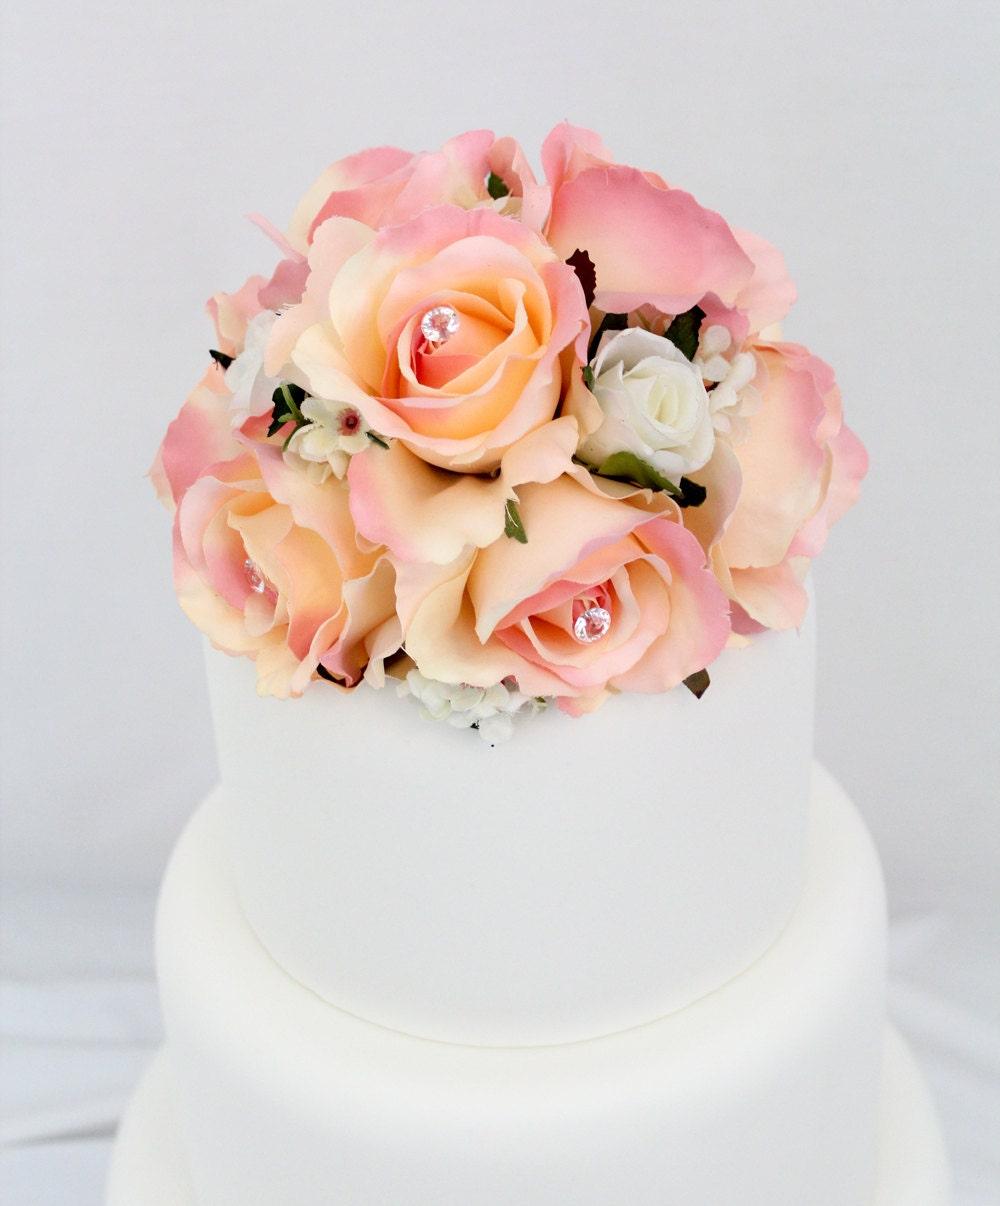 Silk Flower Wedding Cake Toppers: Wedding Cake Topper Pink Rose Silk Flower Wedding Cake